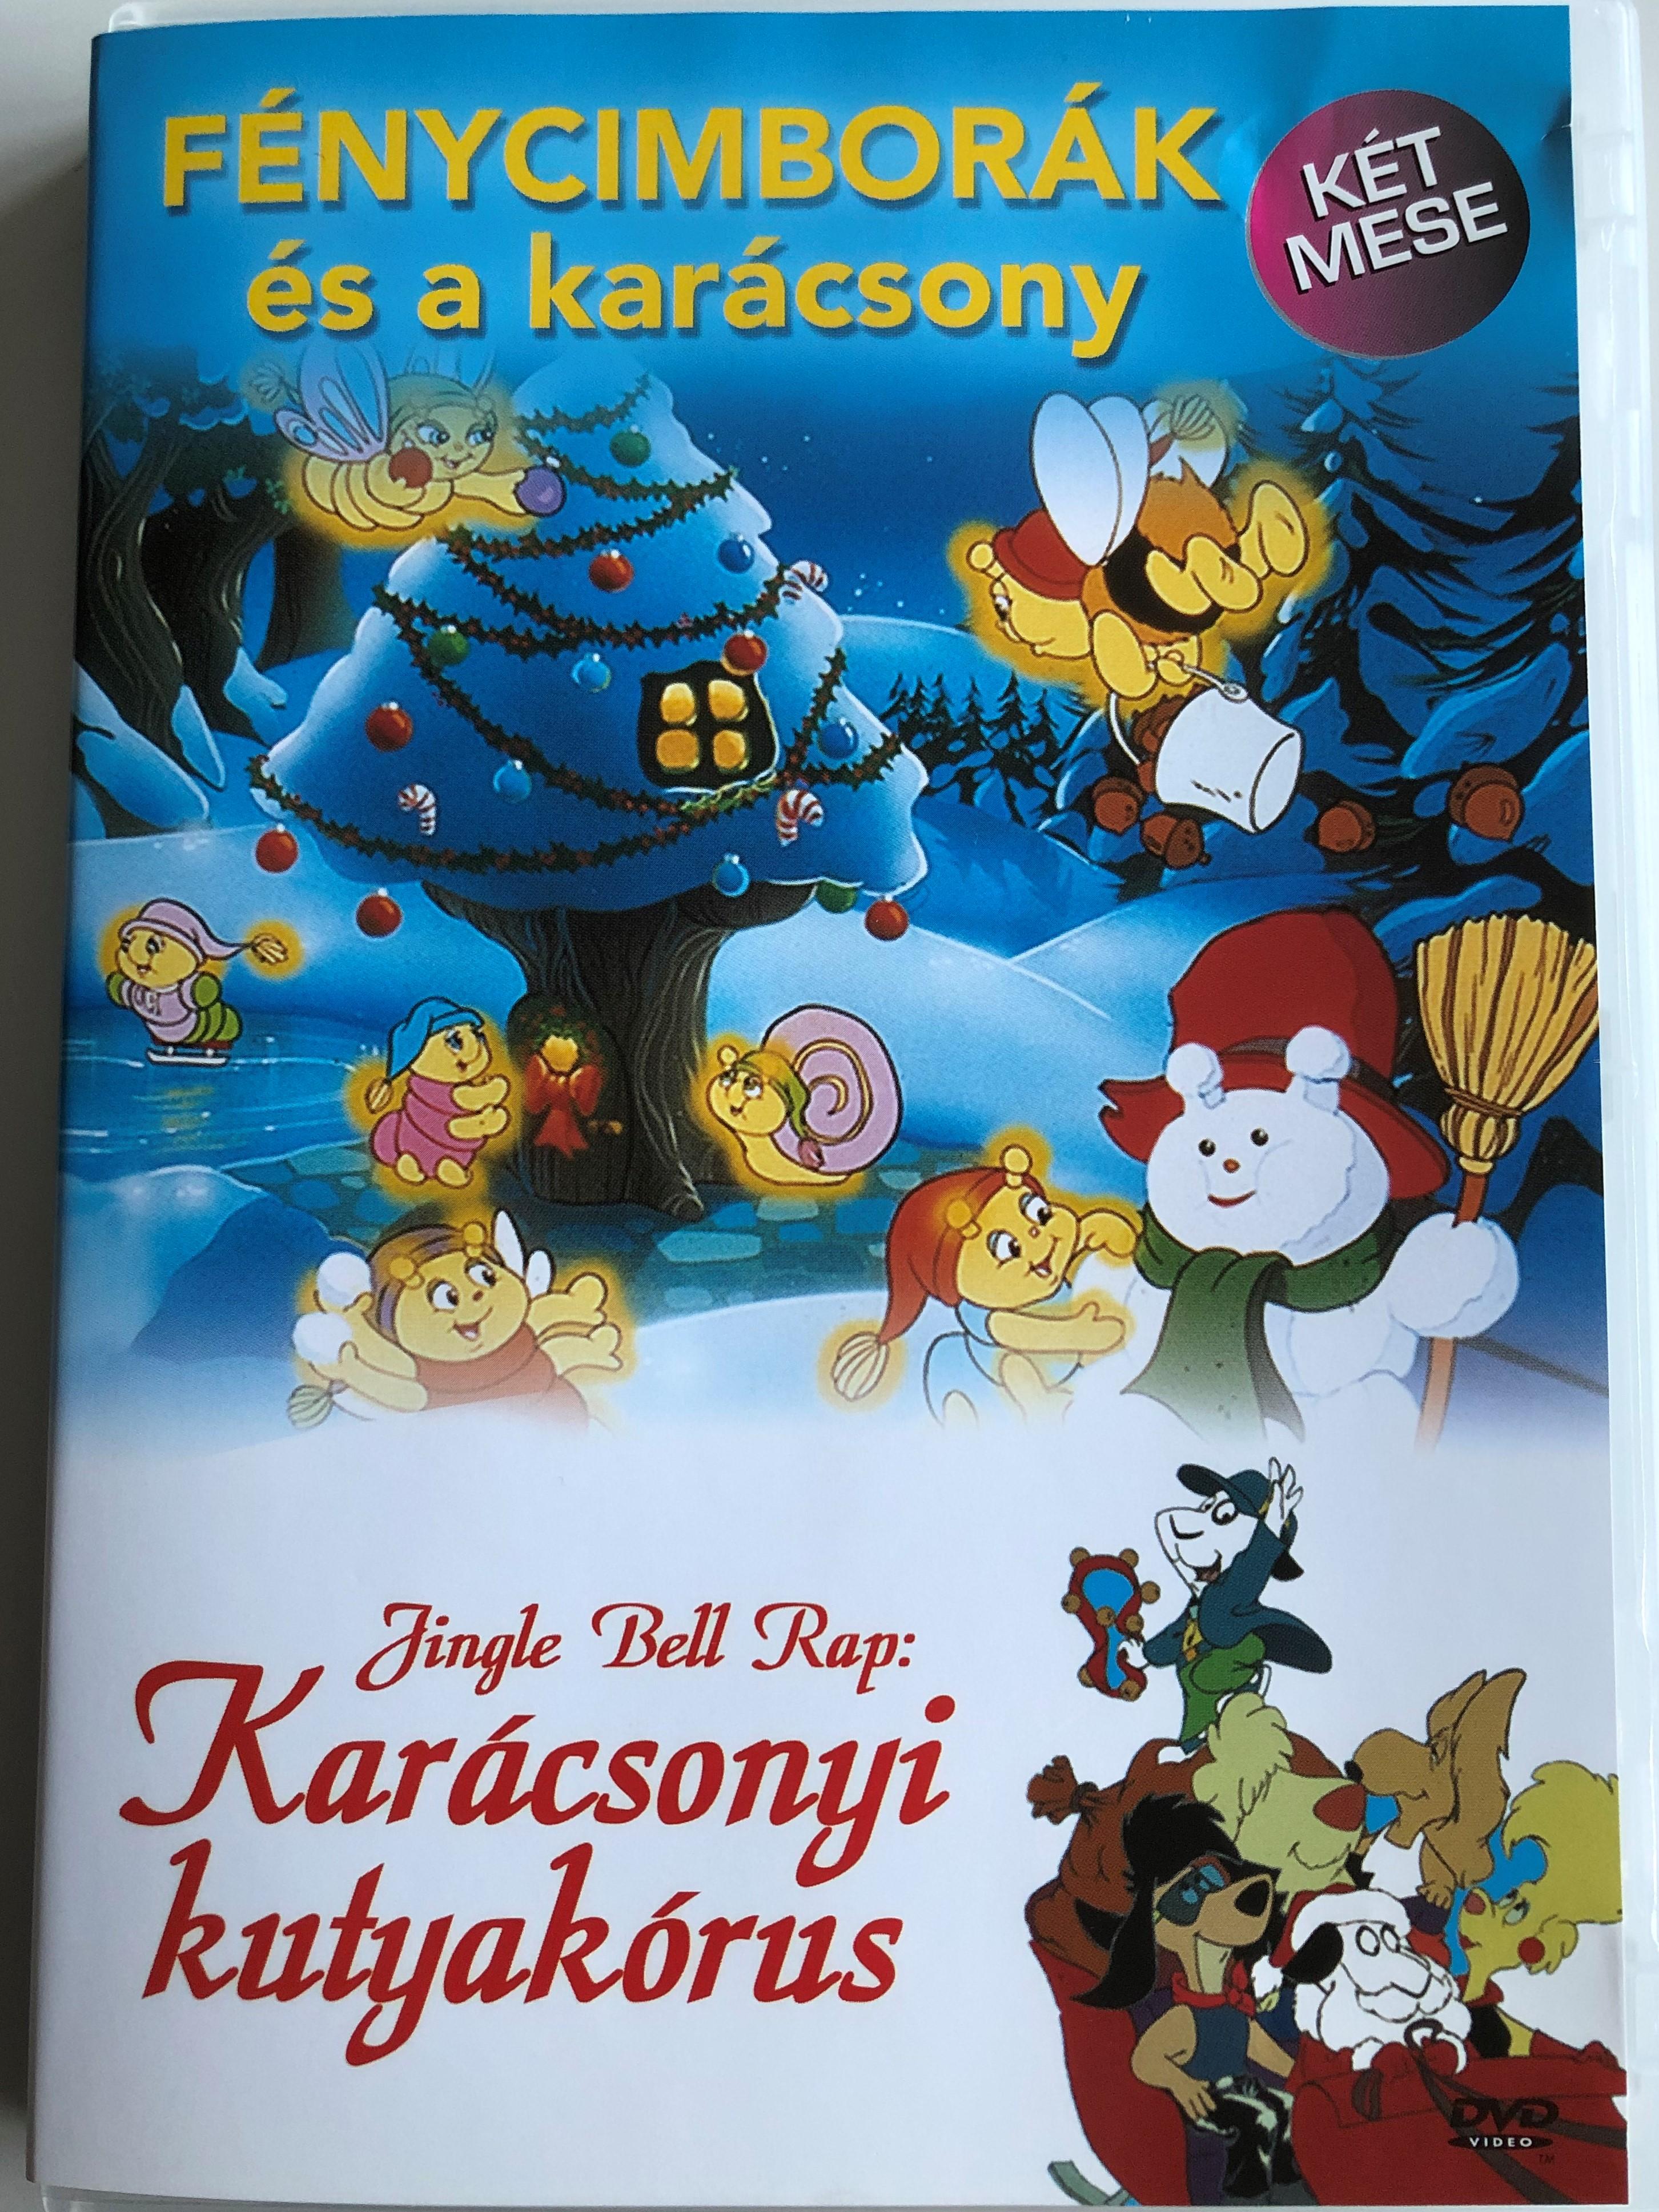 the-glo-friends-save-christmas-dvd-1985-f-nycimbor-k-s-a-kar-csony-jingle-bell-rap-kar-csonyi-kutyak-rus-directed-by-antoni-d-ocon-1-.jpg